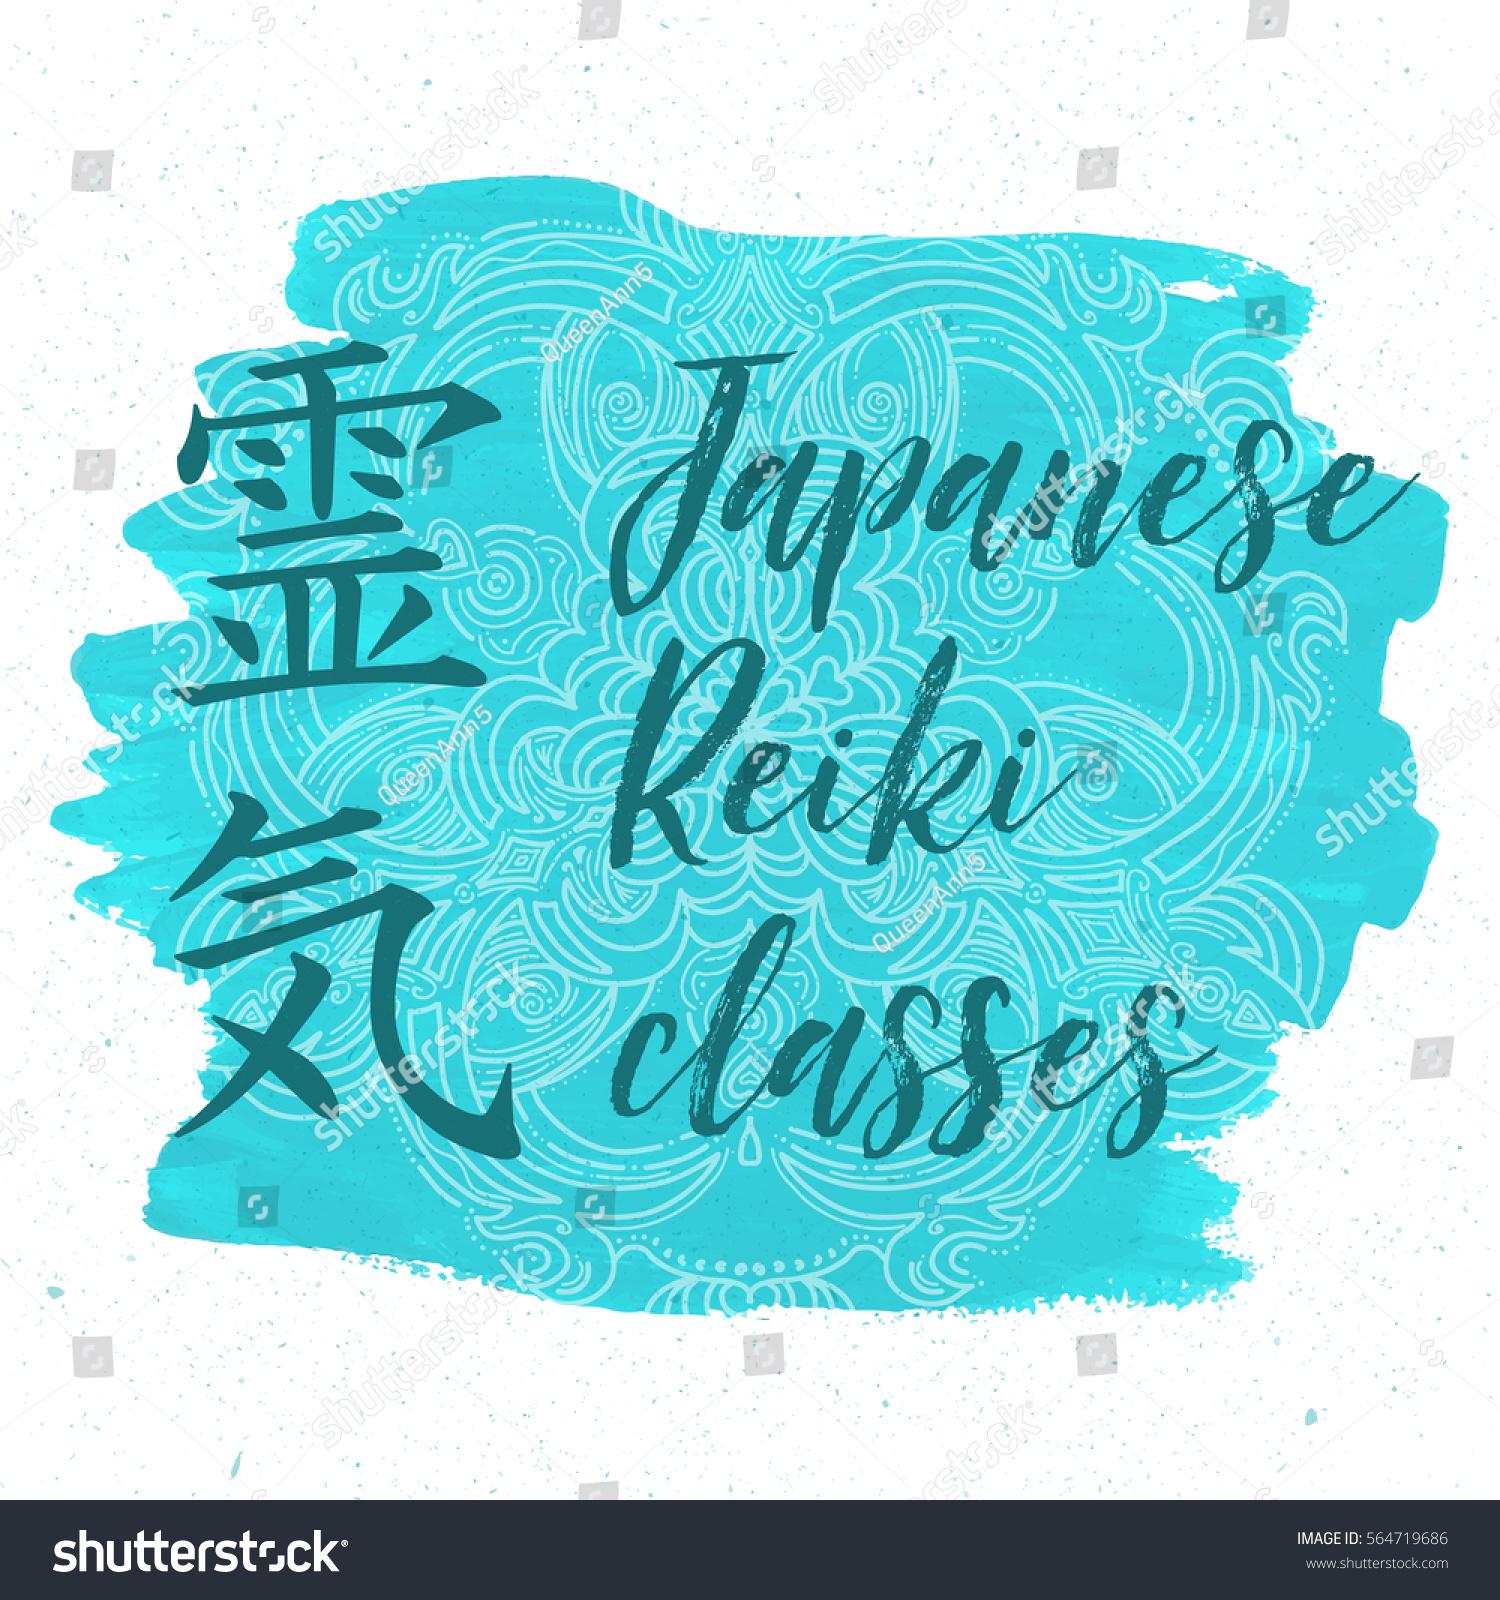 Sacred geometry reiki symbol word reiki stock vector 564719686 sacred geometry reiki symbol the word reiki is made up of two japanese words biocorpaavc